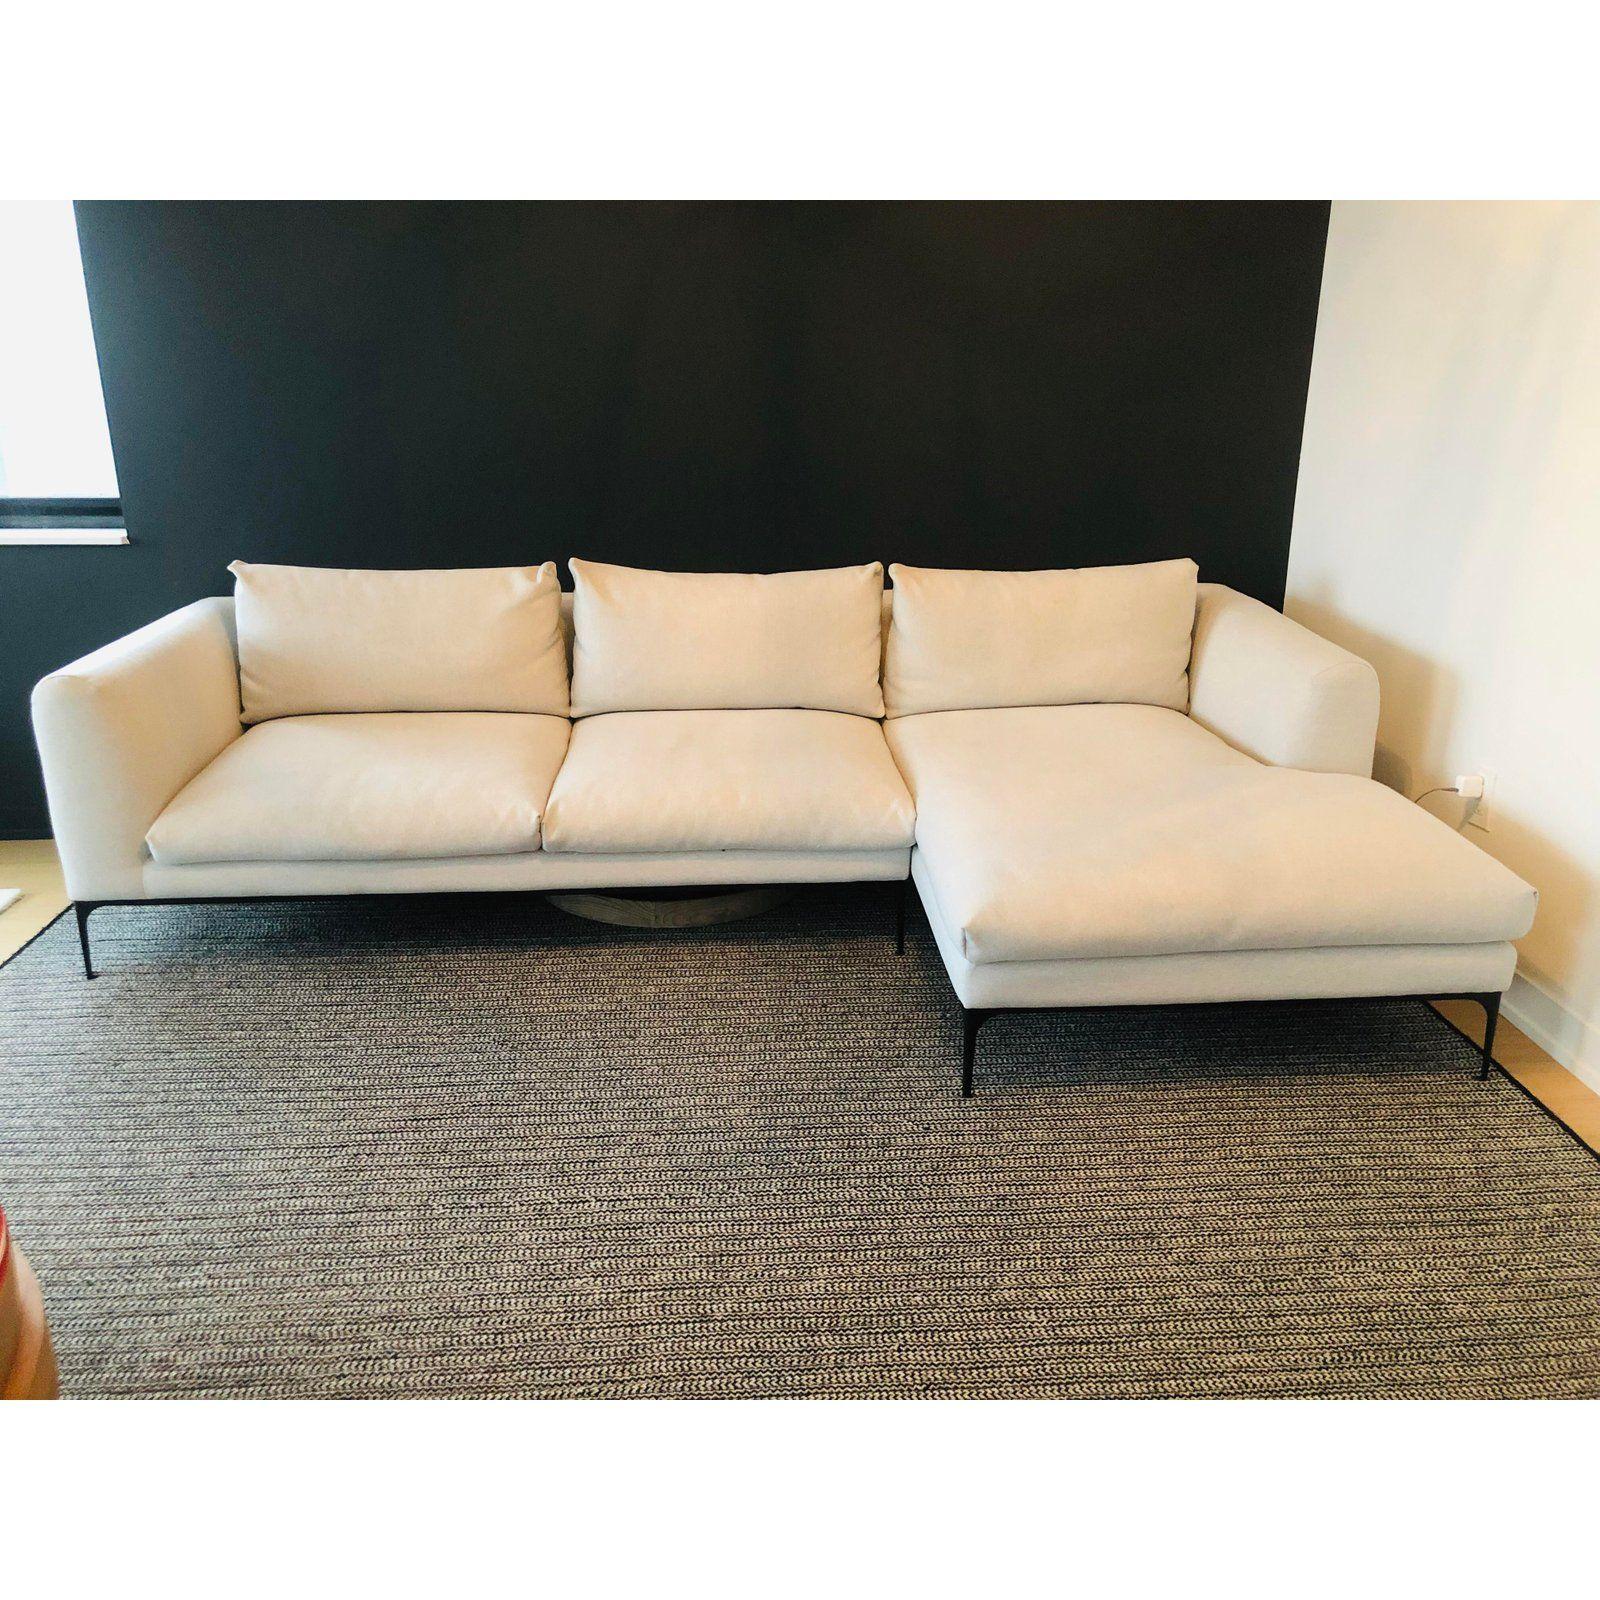 Modern Design Within Reach Jonas Sectional Design Within Reach Modern Design Sell Used Furniture